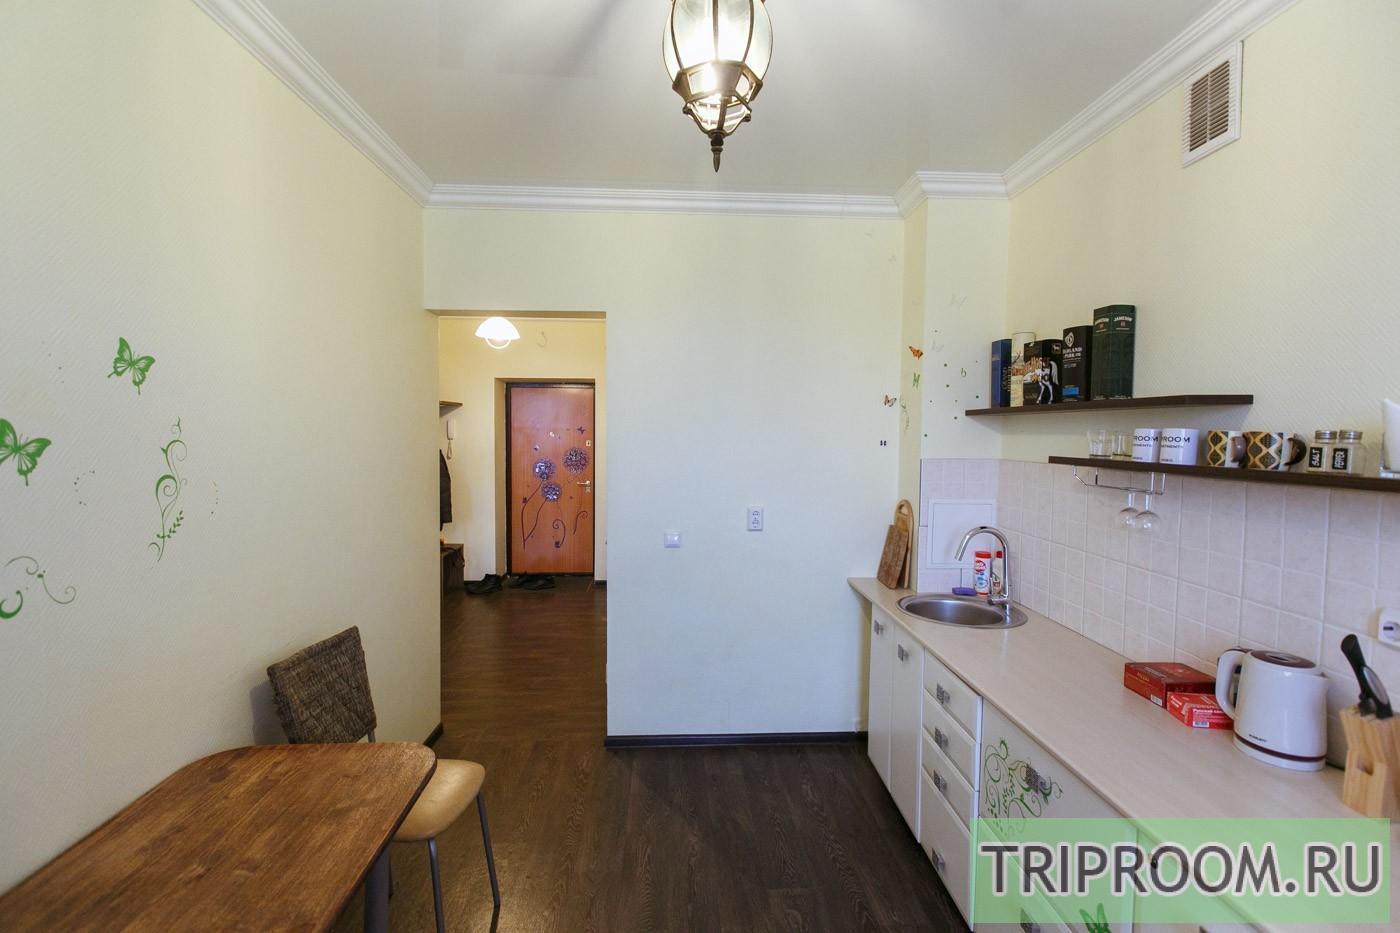 1-комнатная квартира посуточно (вариант № 28539), ул. П.И. Смородина, фото № 8